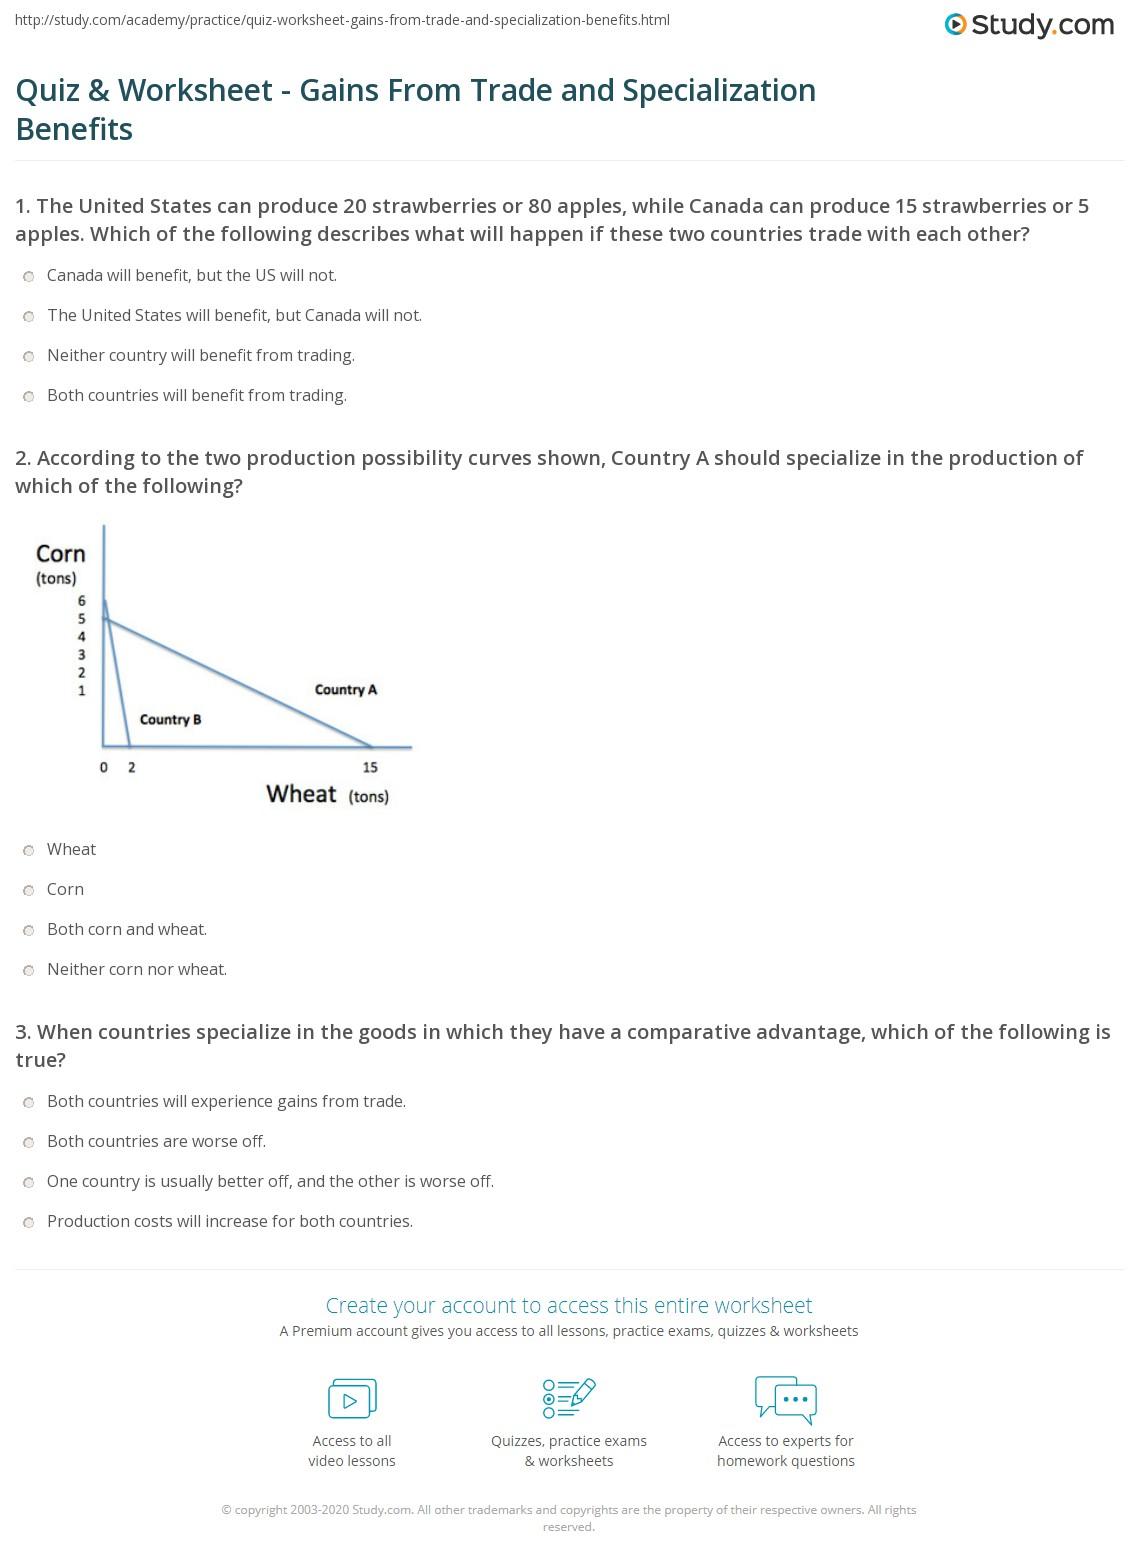 worksheet Comparative Advantage Worksheet quiz worksheet gains from trade and specialization benefits print the benefit of worksheet